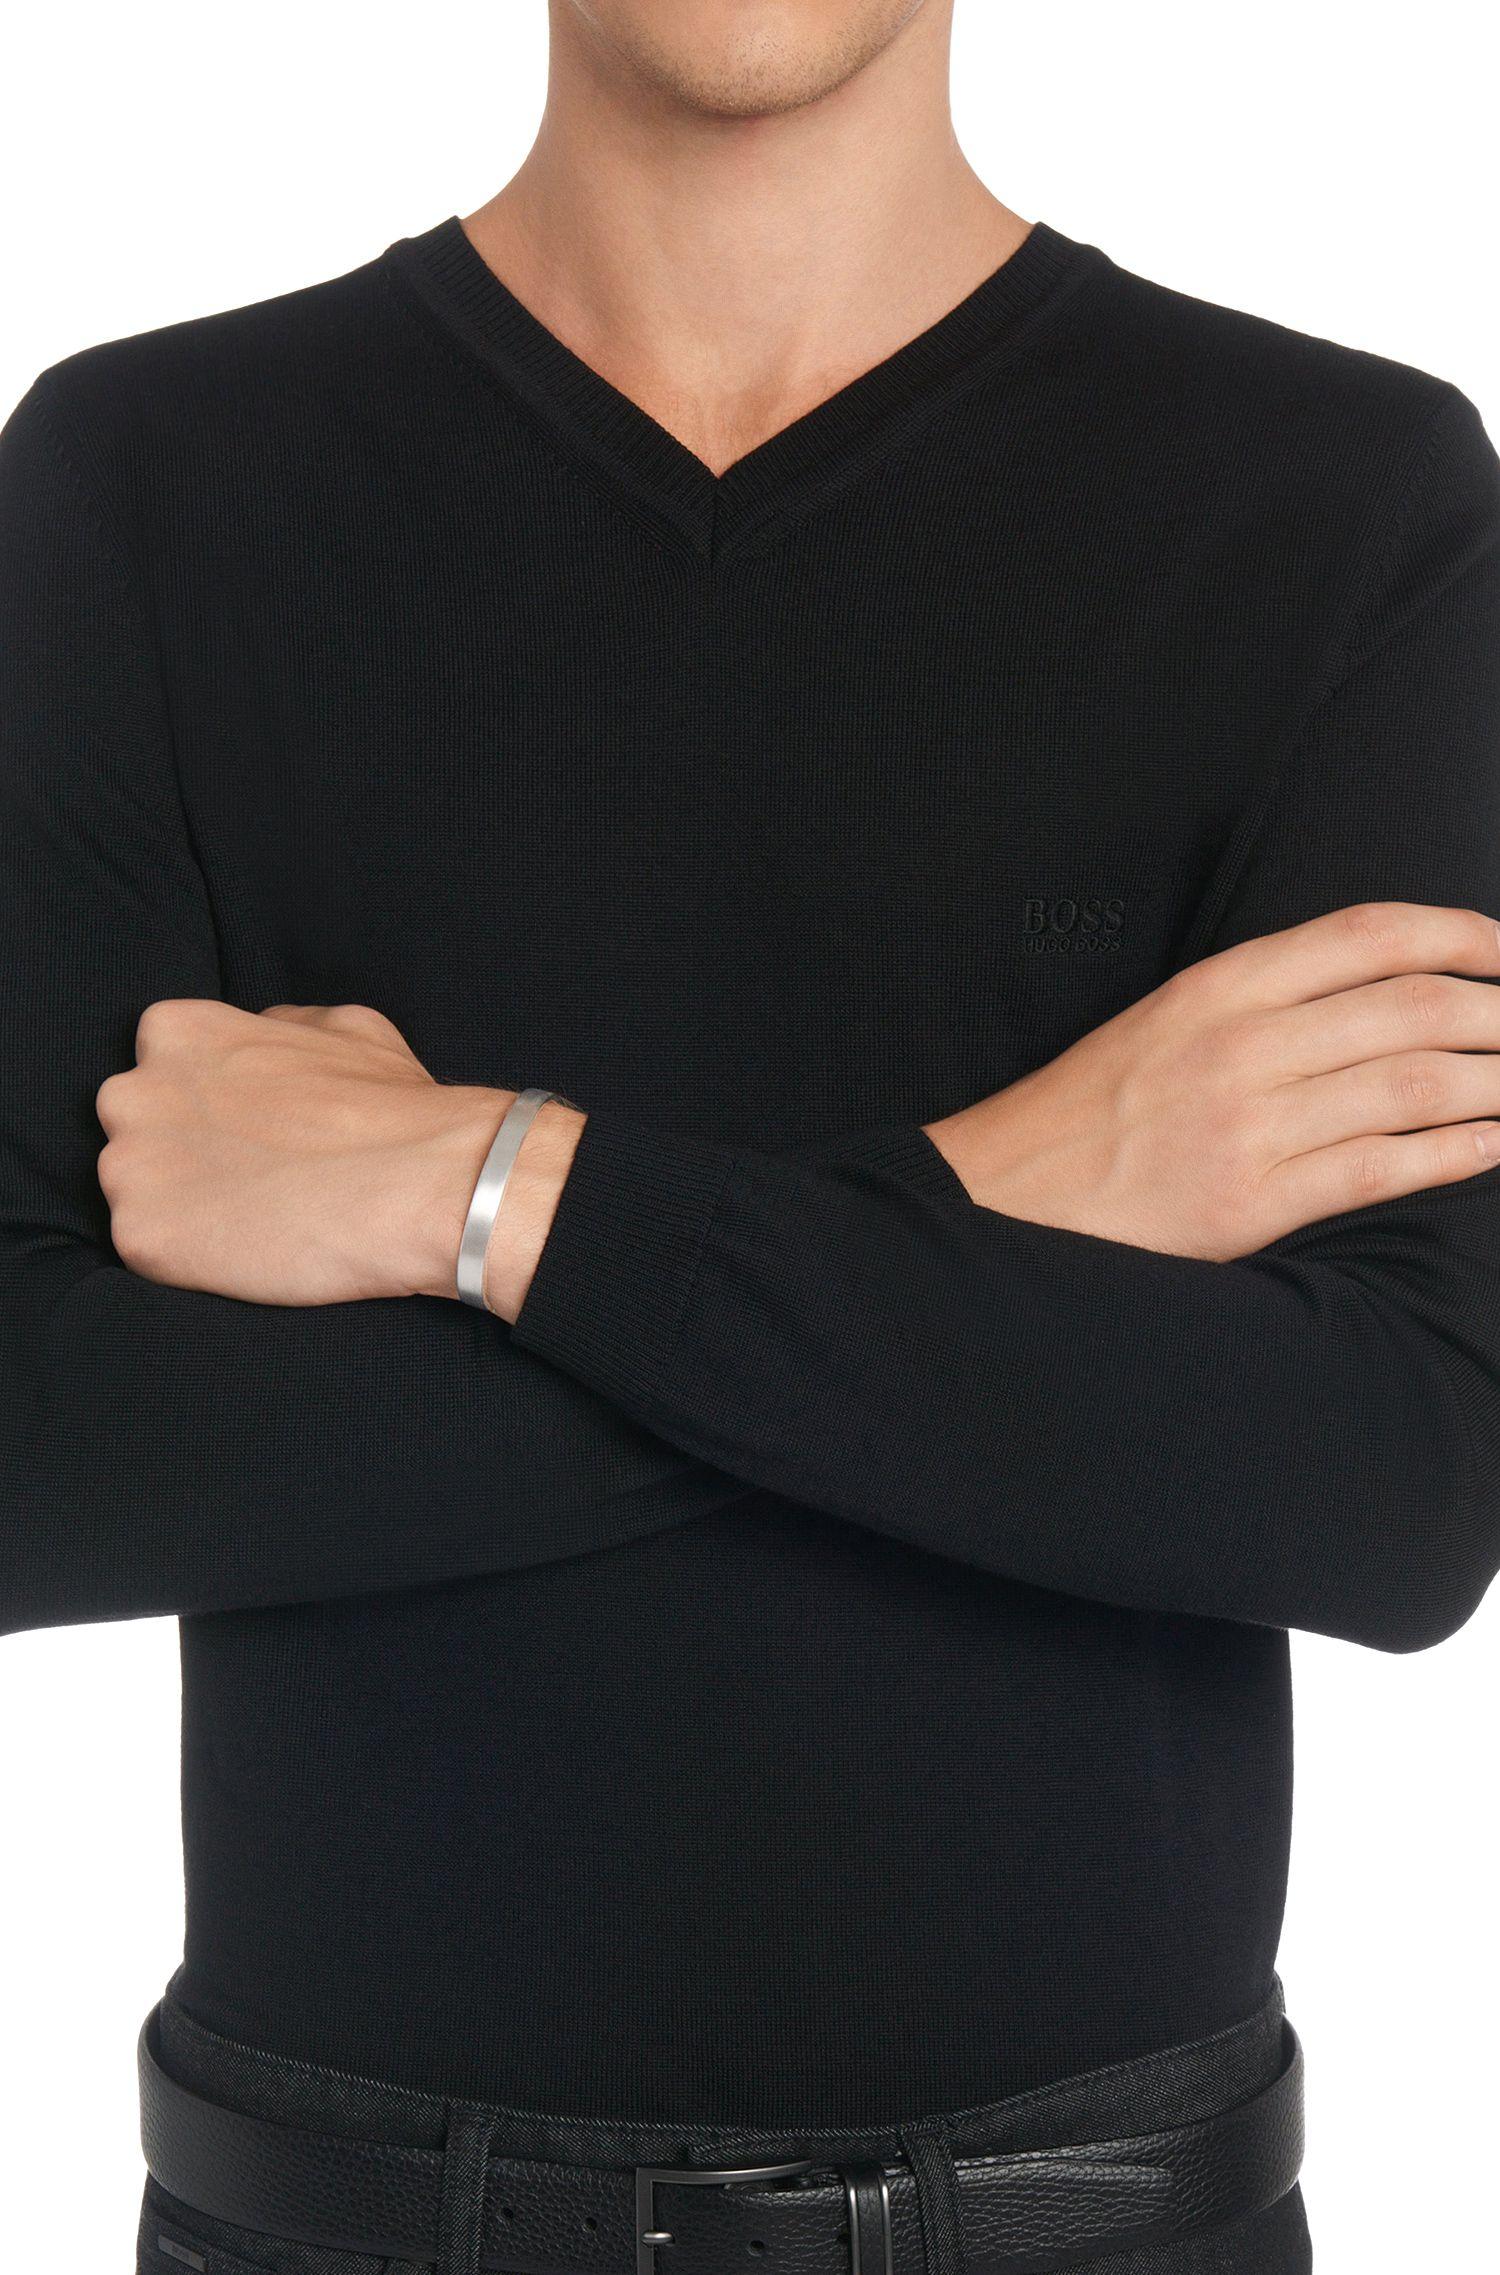 Armband van sterlingzilver met geborsteld oppervlak: 'Bernard'